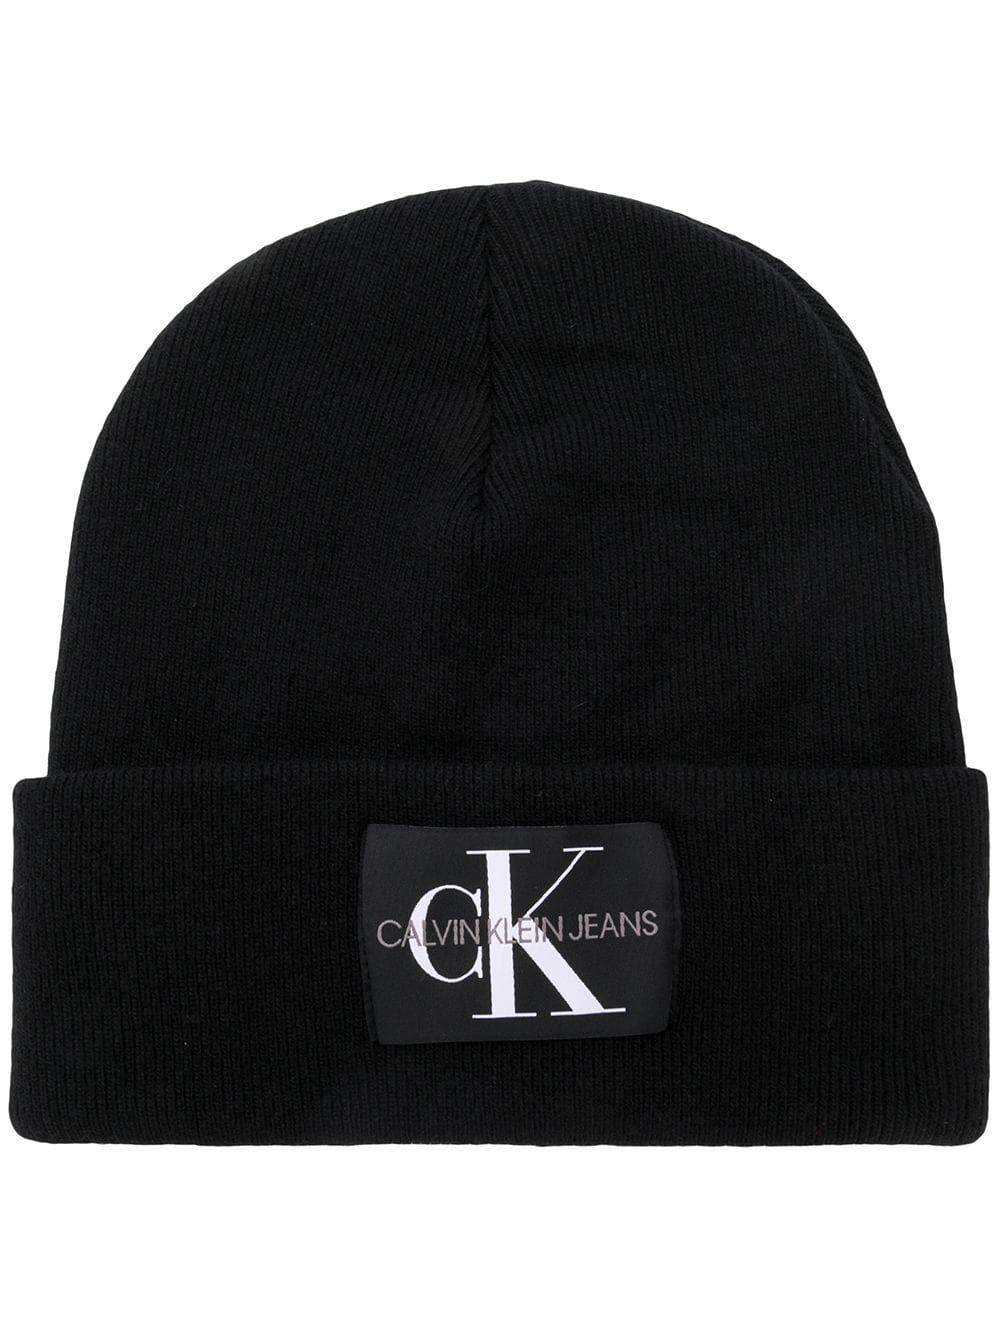 adc8dd460191e Calvin Klein Jeans Logo Patch Beanie In Black